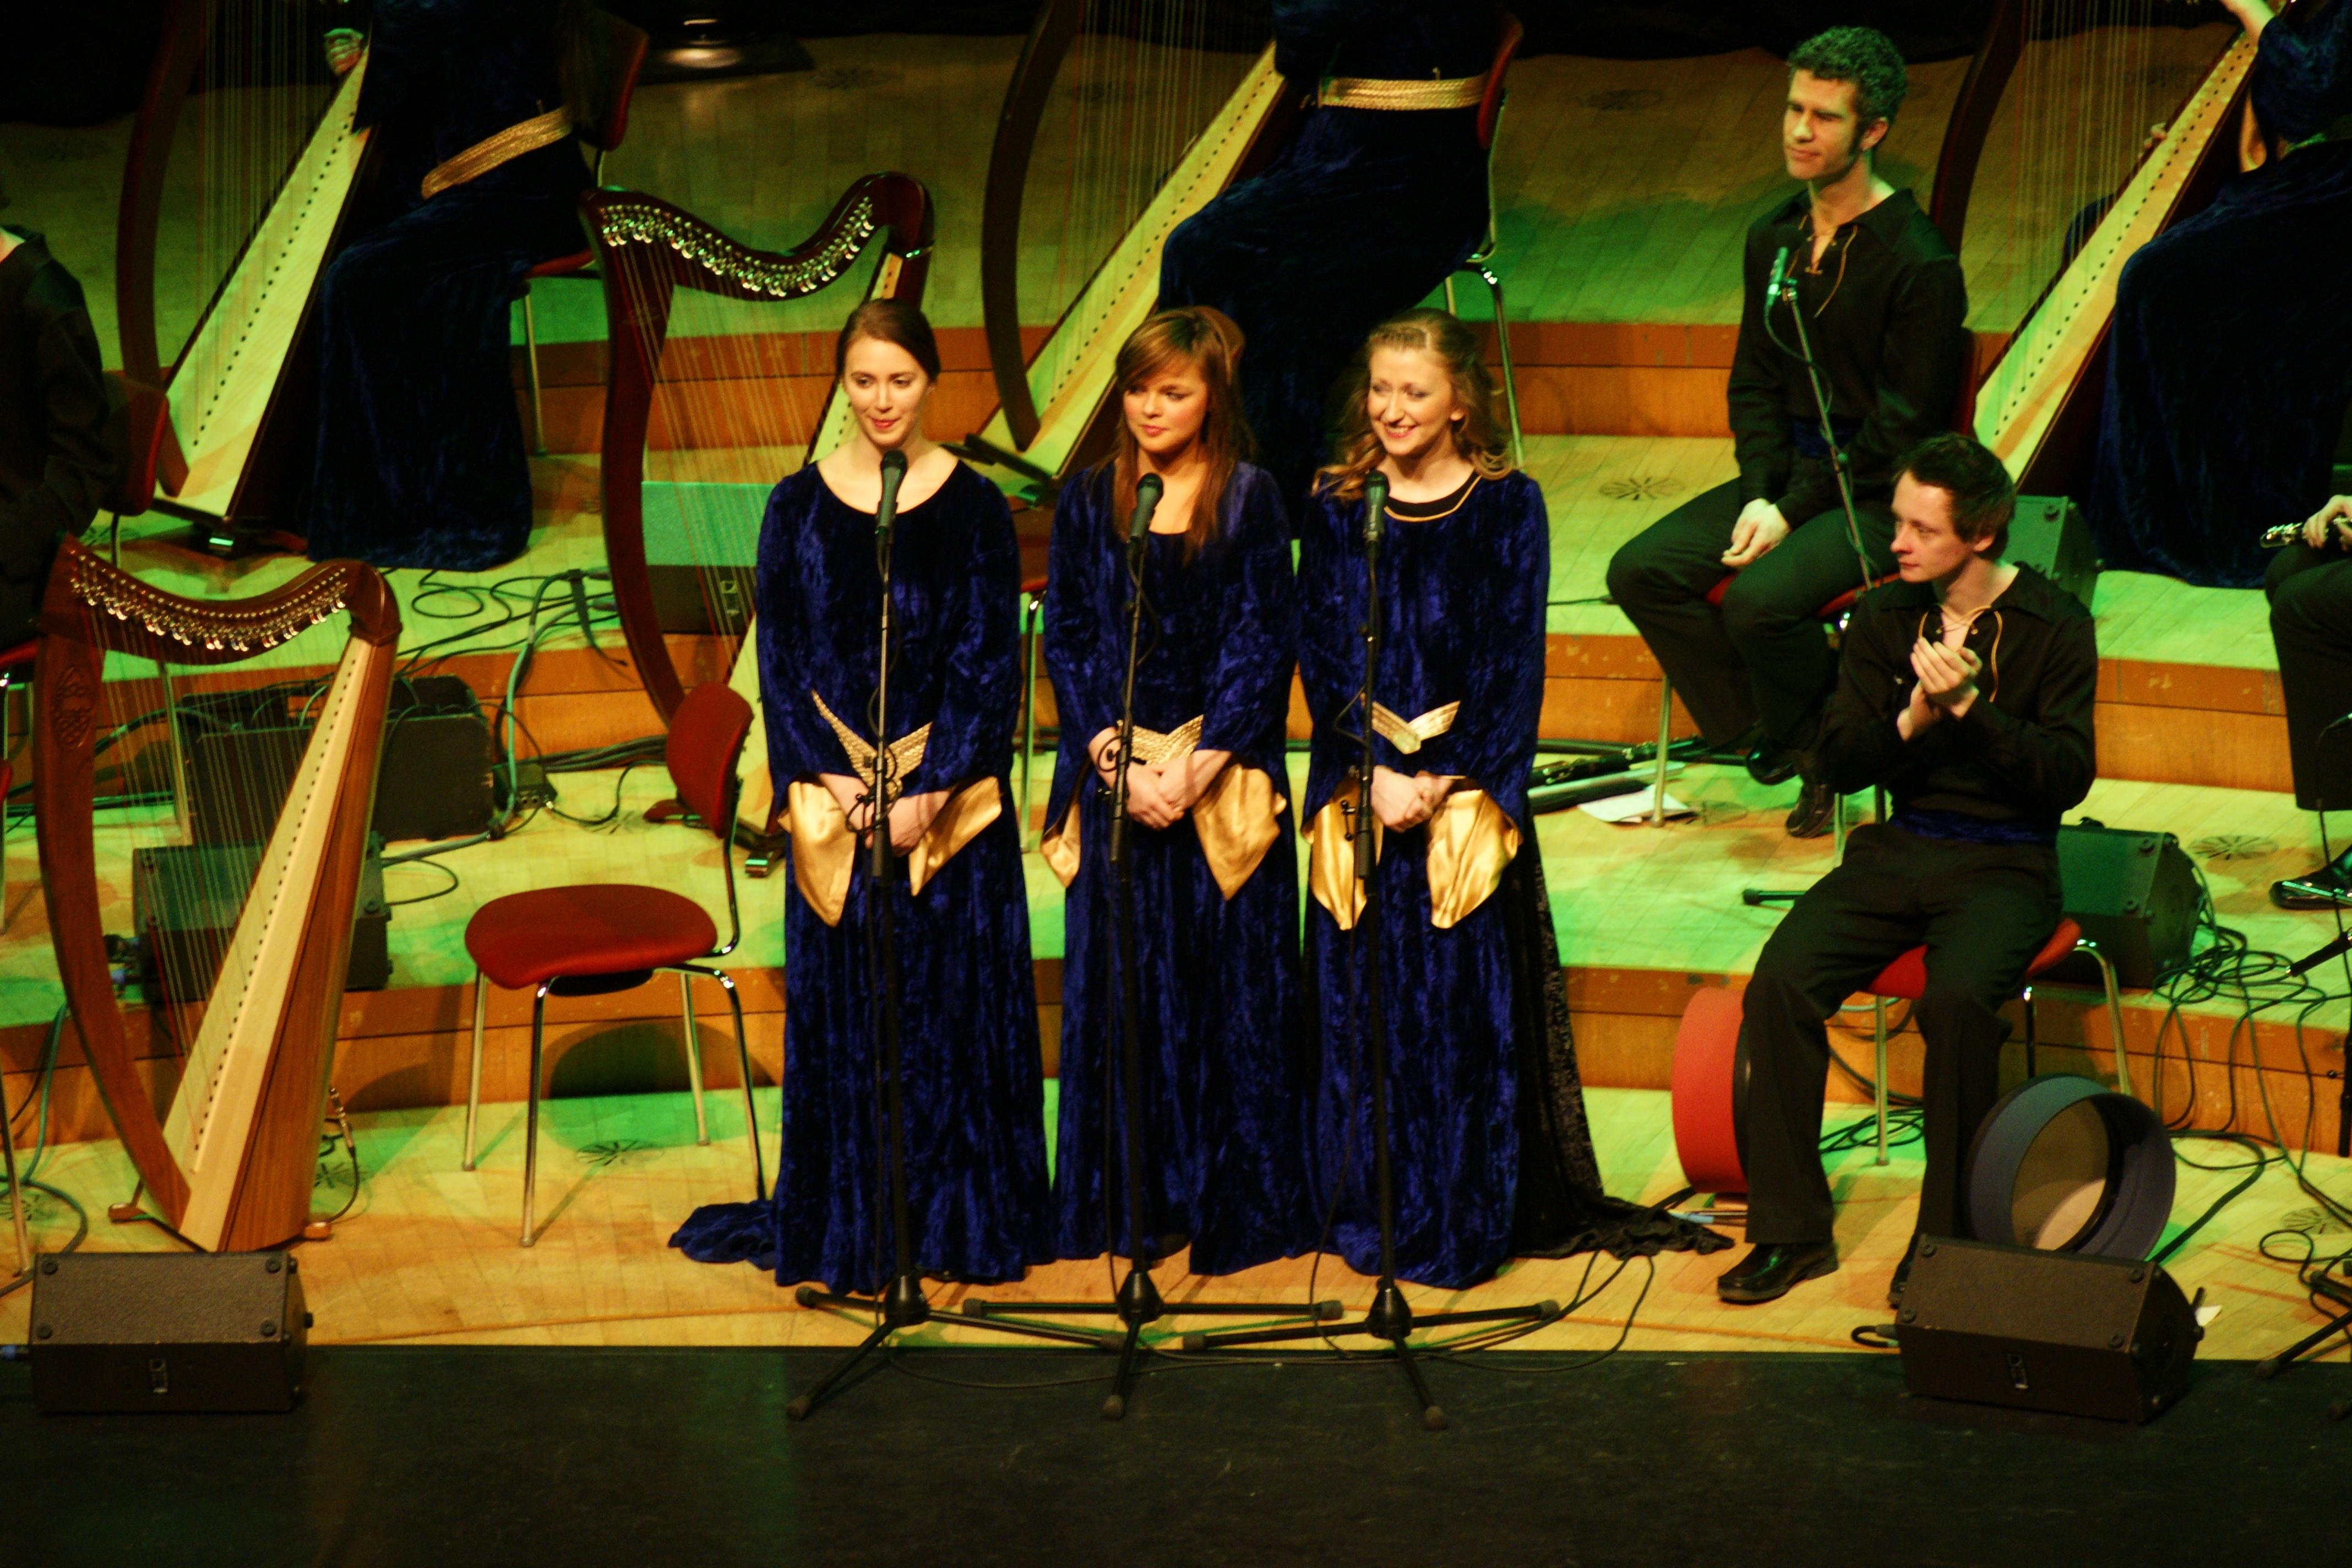 a-iho-09-singers-trio